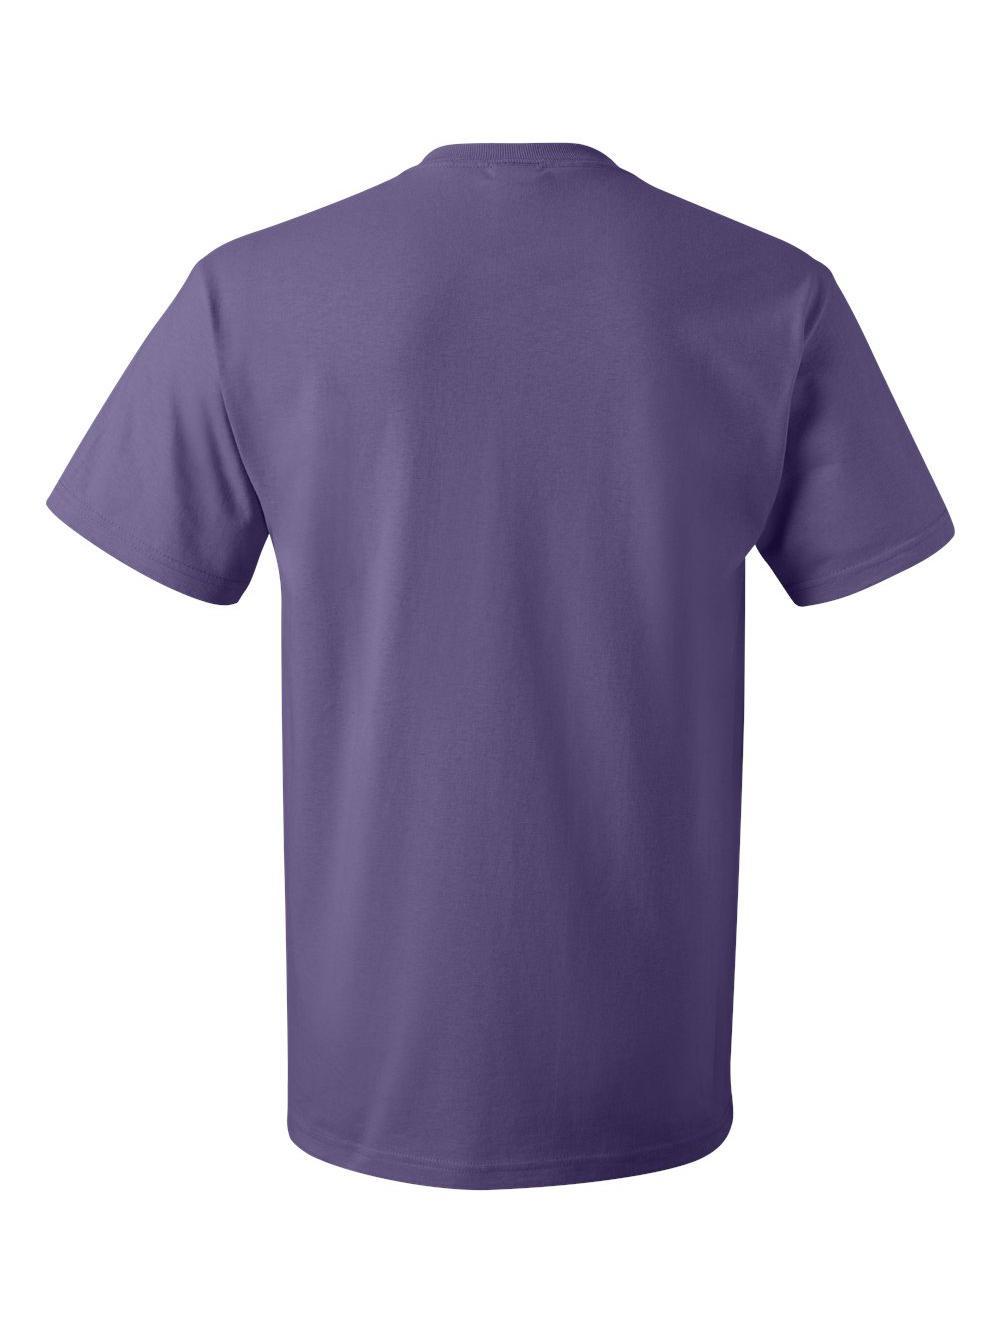 Fruit-of-the-Loom-HD-Cotton-Short-Sleeve-T-Shirt-3930R thumbnail 94